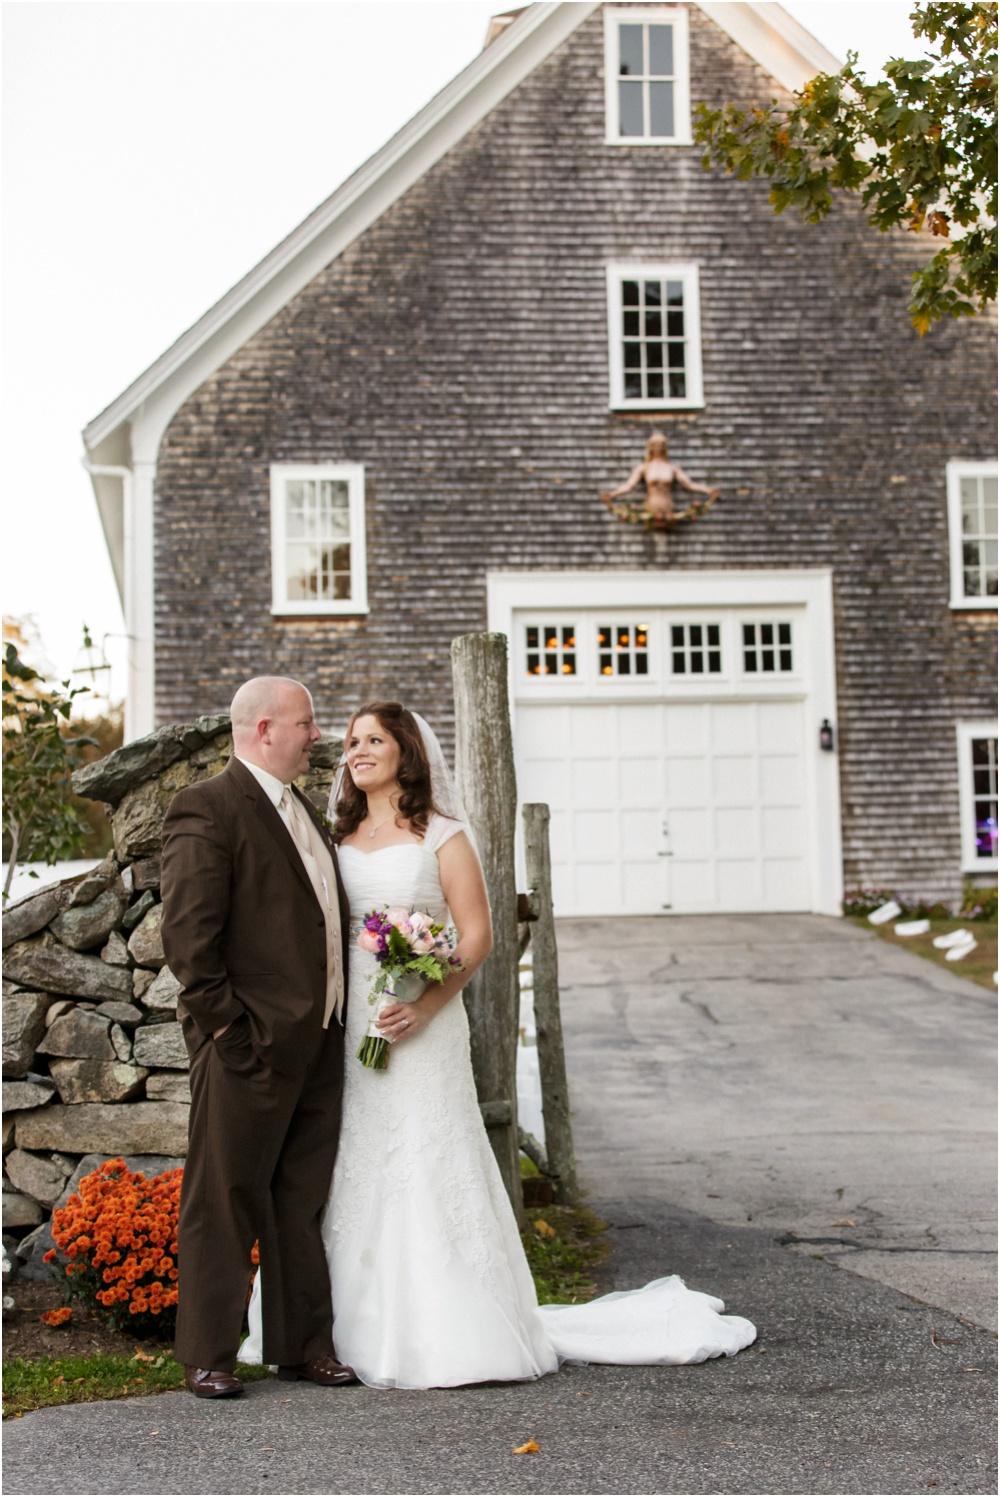 RI-Wedding-Photographer-Lefebvre-Photo-Blog_2745.jpg